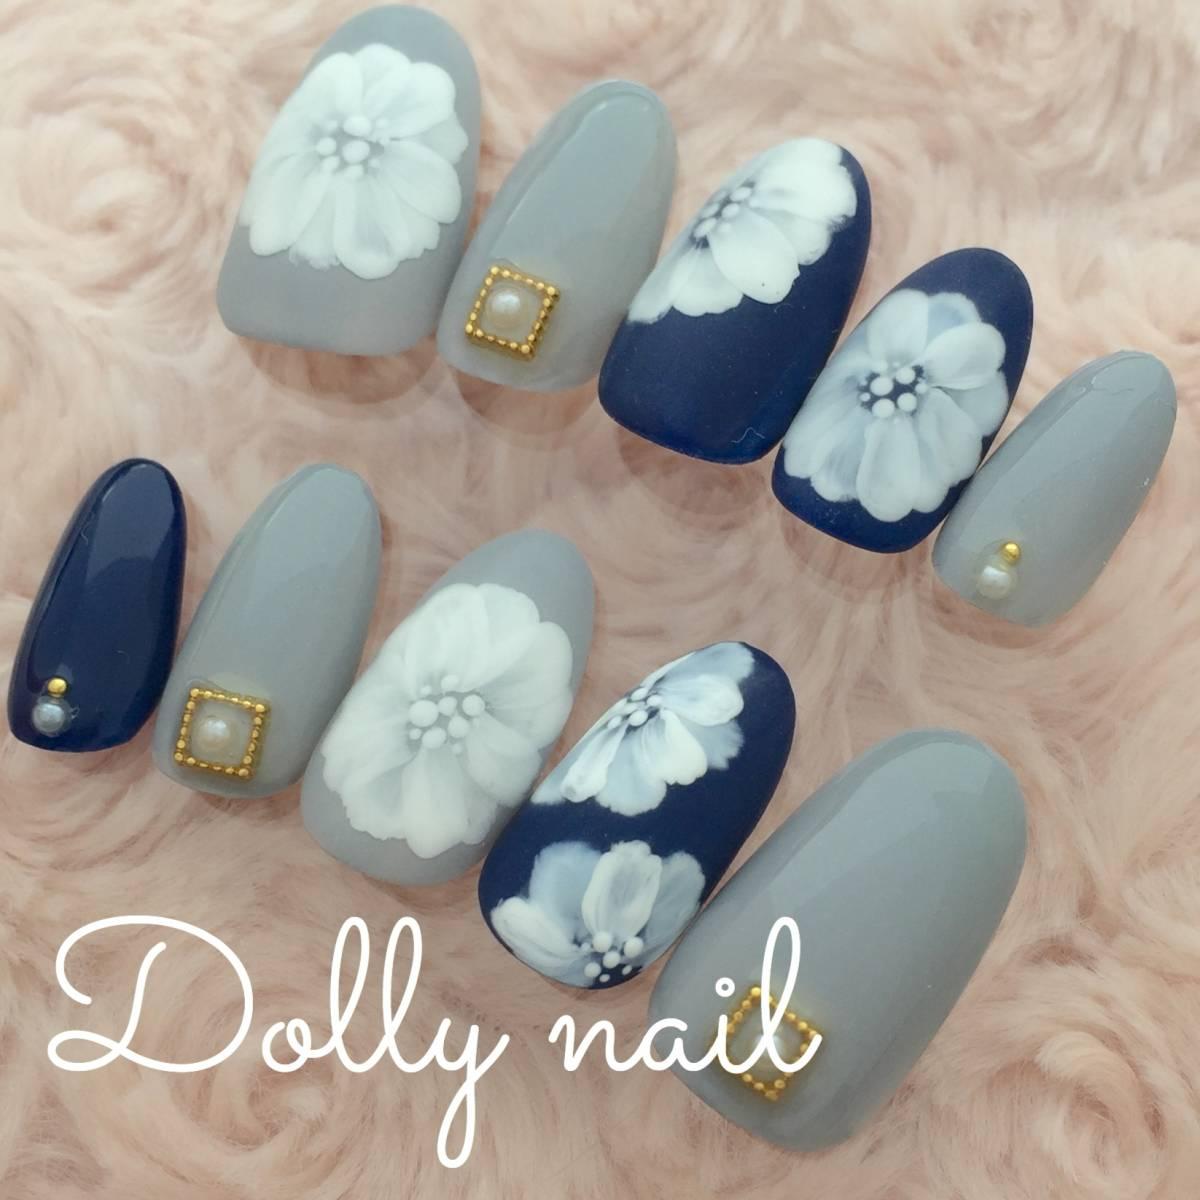 Dn Short Oval Large Wheel Flower Navy Blue Color Grey Gray Nail Display Chart Polish Nails